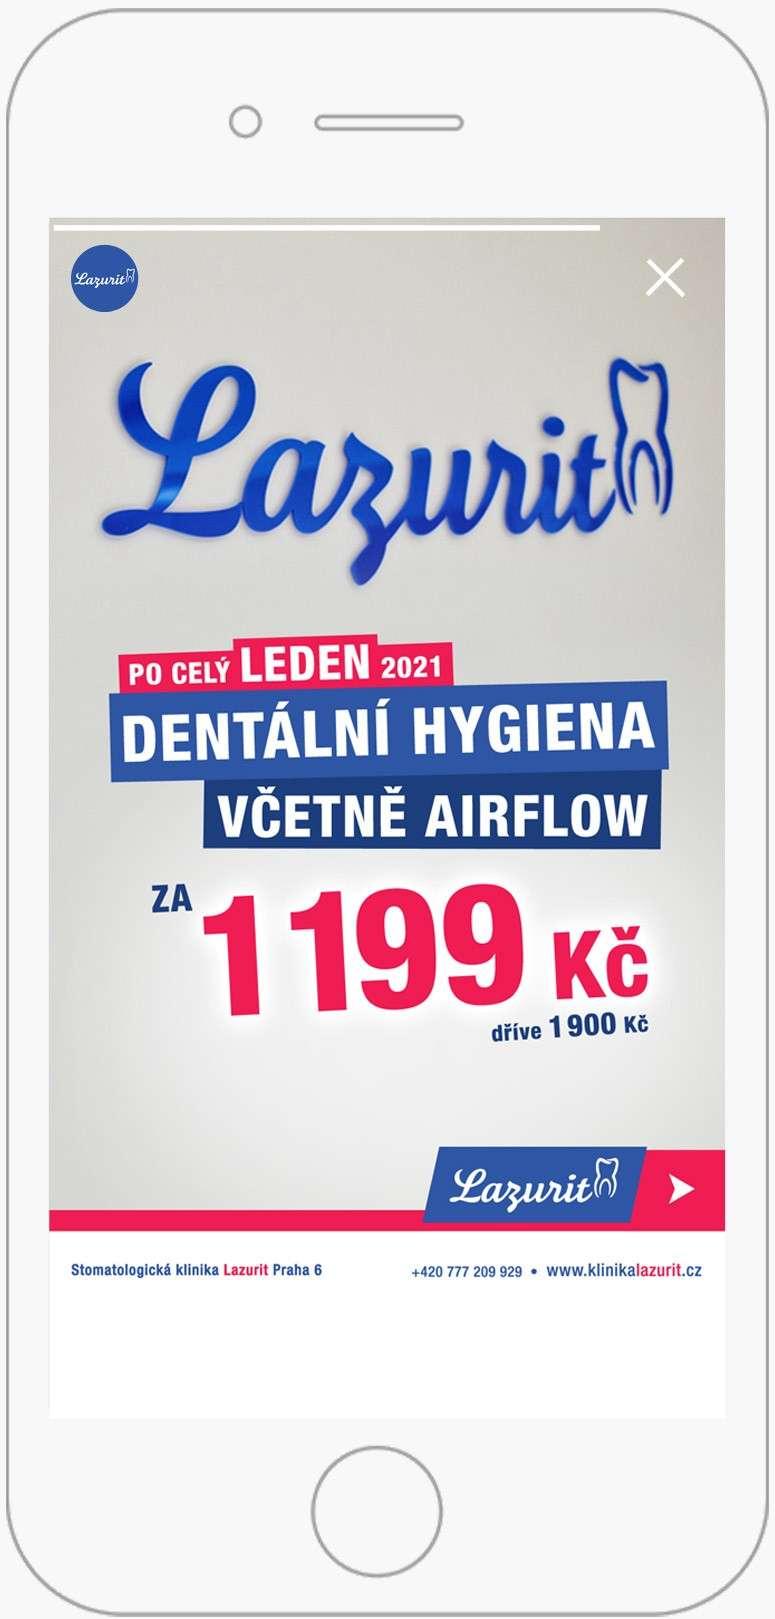 clubadvisor_reference_klinika-lazurit_on-line-marketing_instagram-single_2